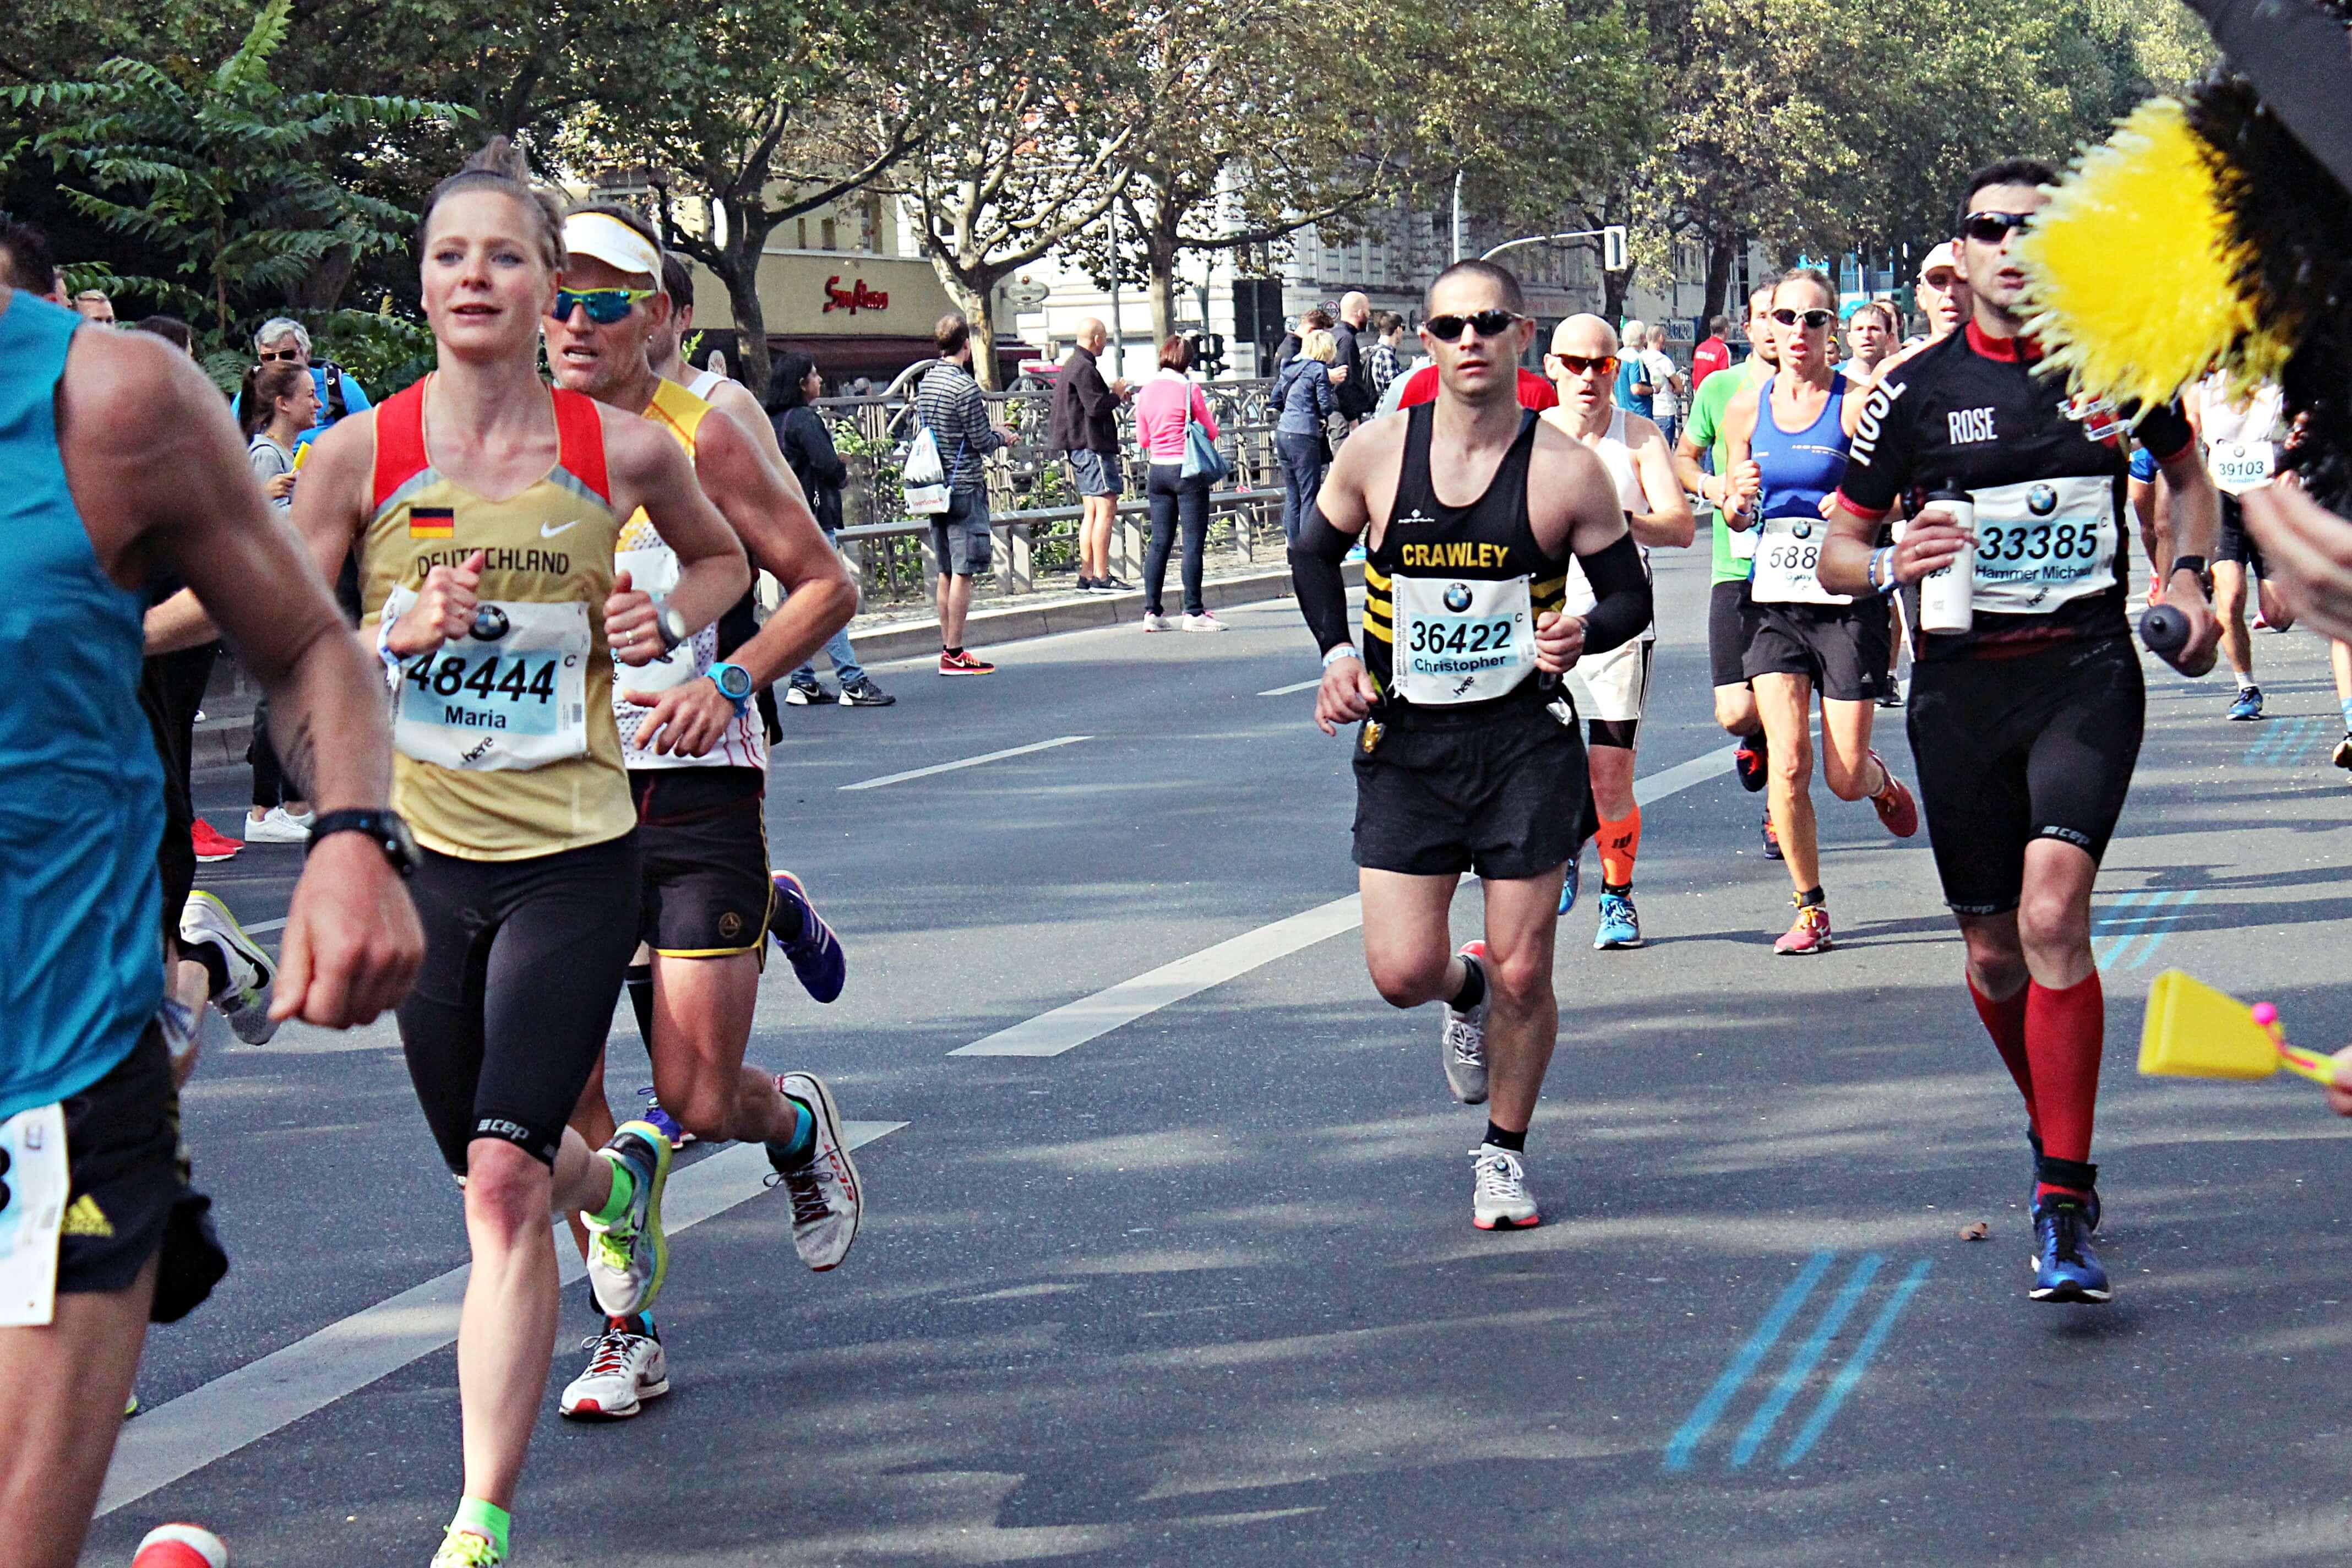 berlin-marathon-runners